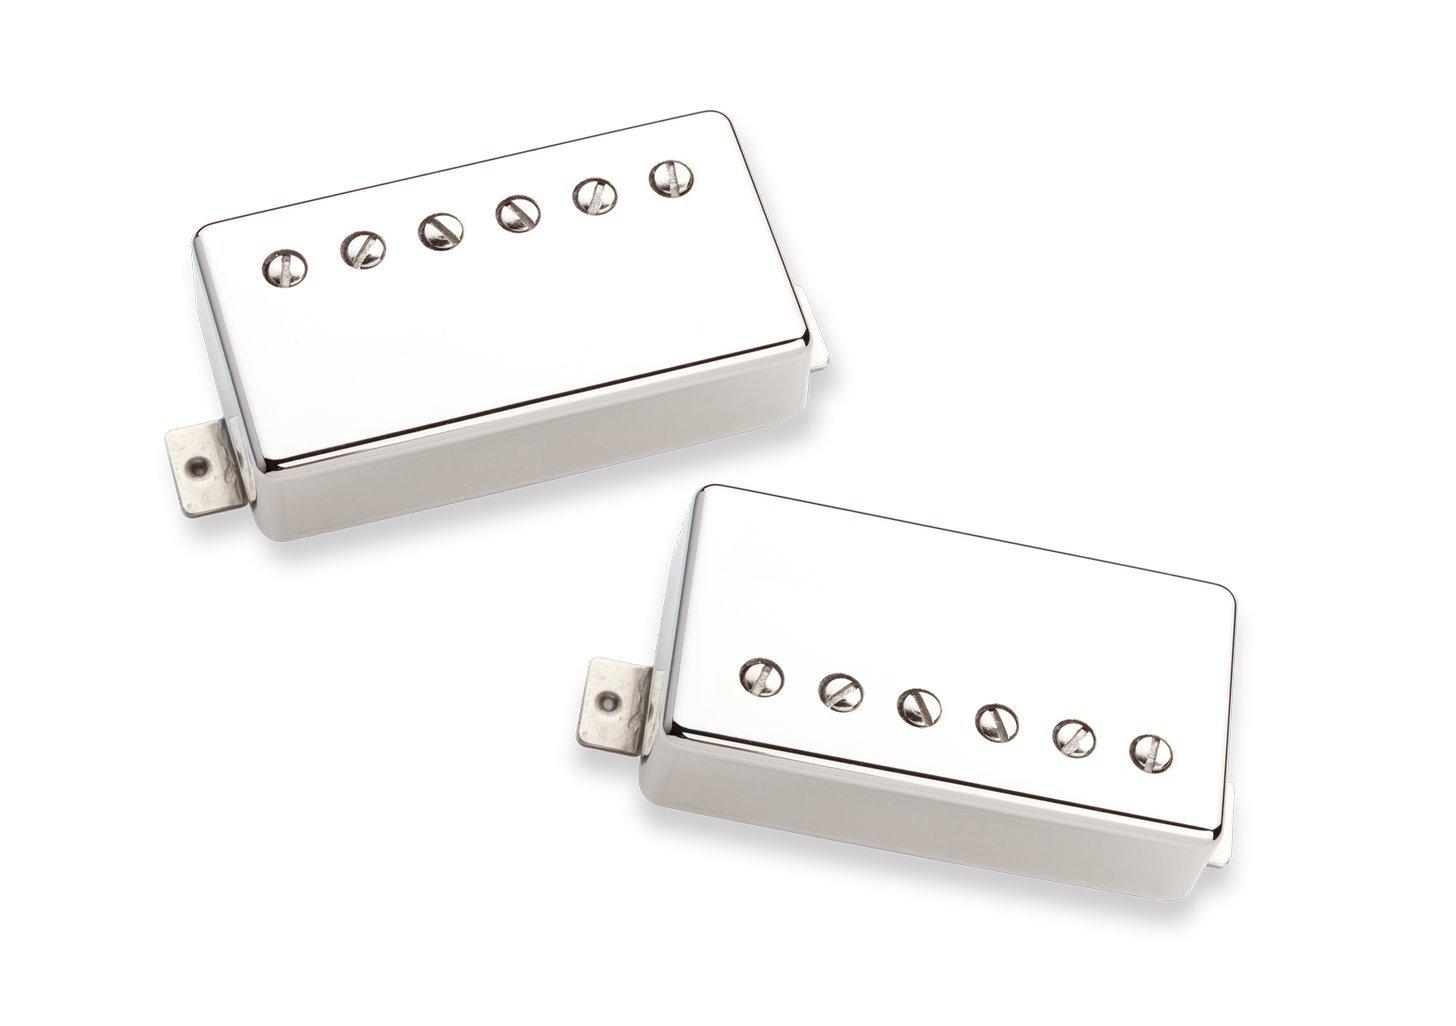 Seymour Duncan Seth amante de níquel para guitarra eléctrica Electronics: Amazon.es: Instrumentos musicales